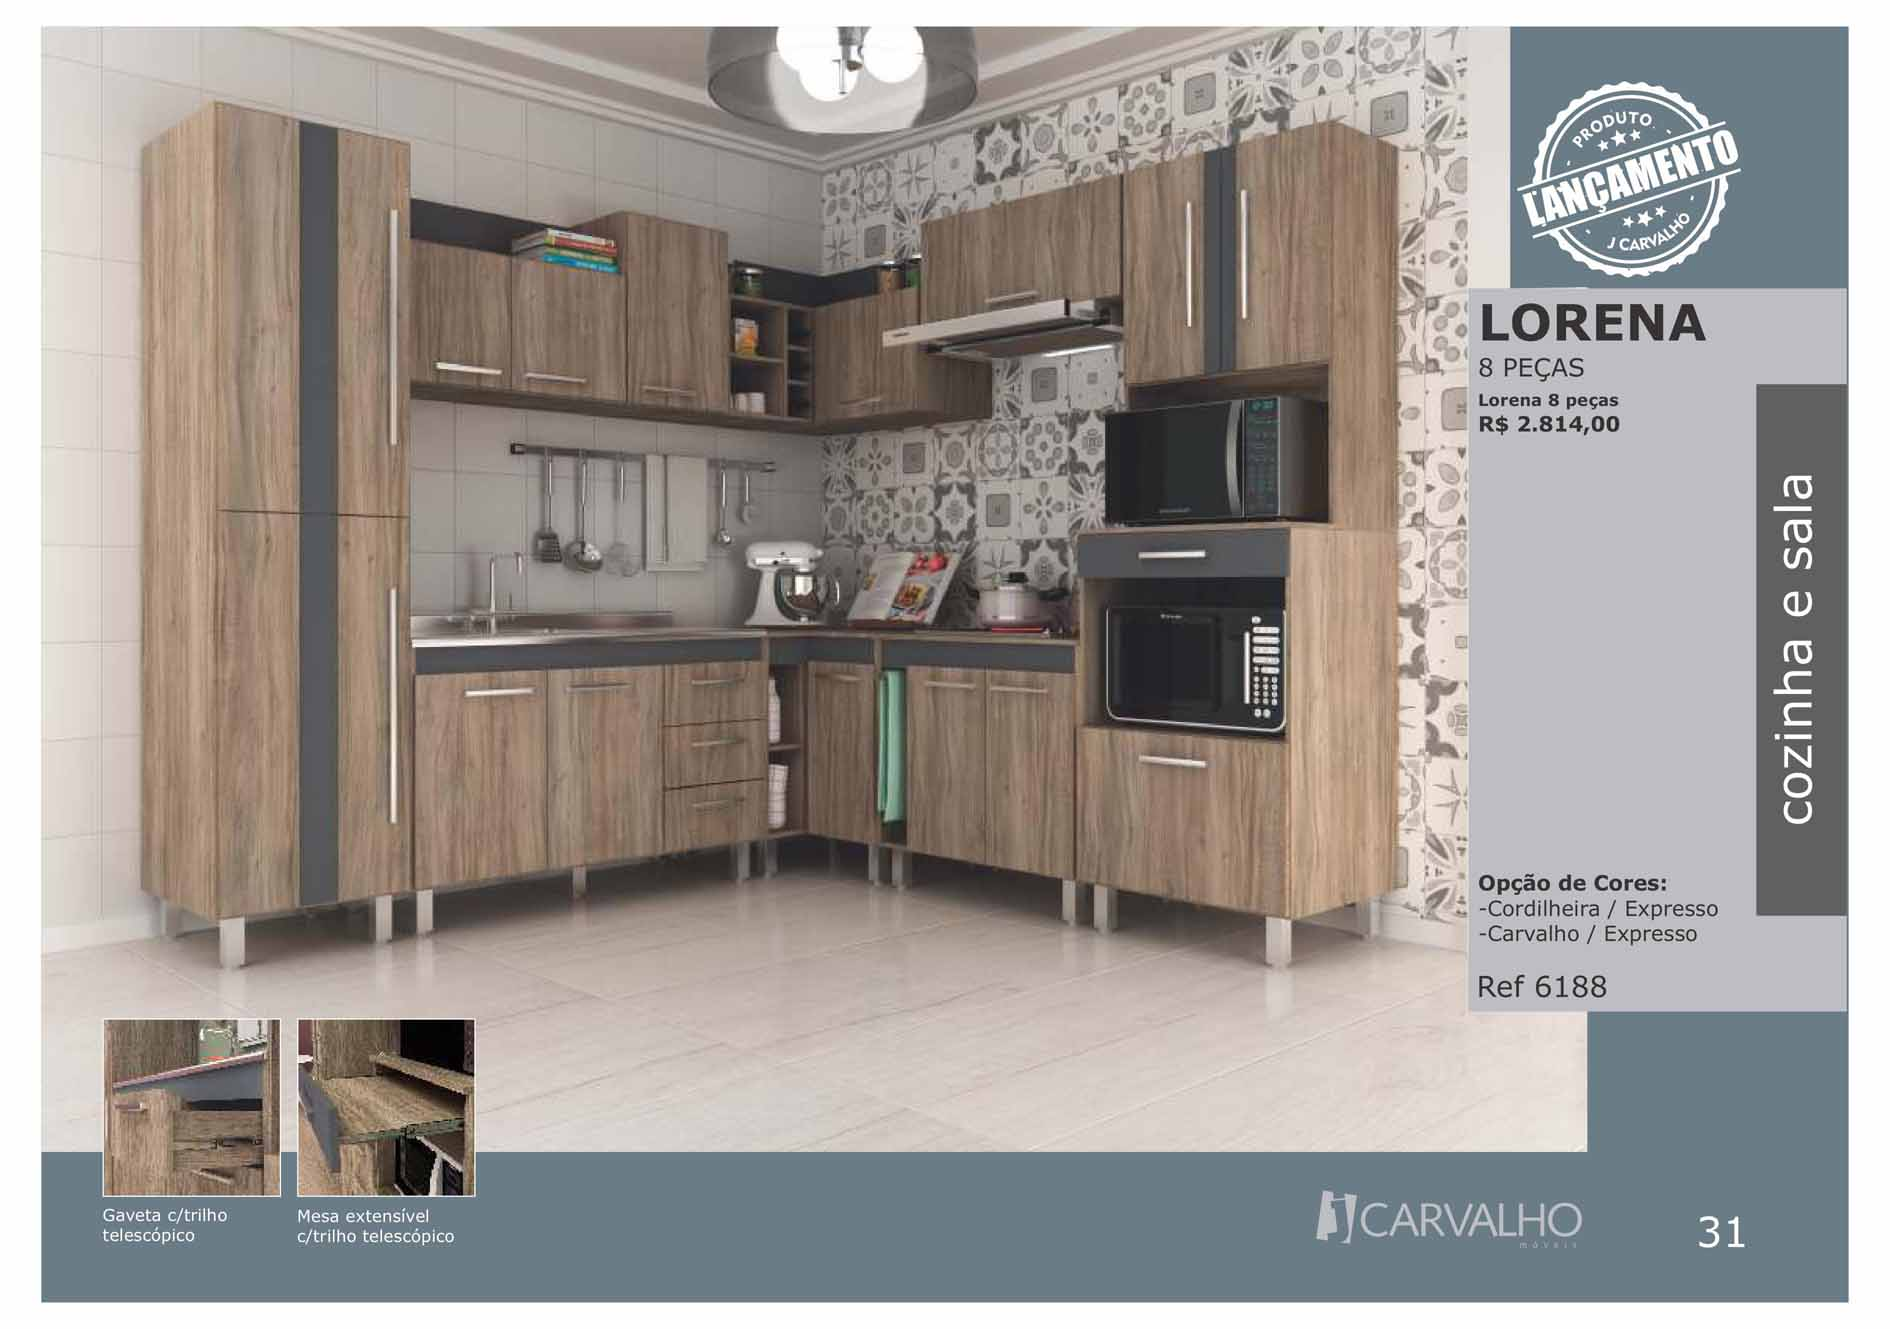 Lorena – Ref 6188